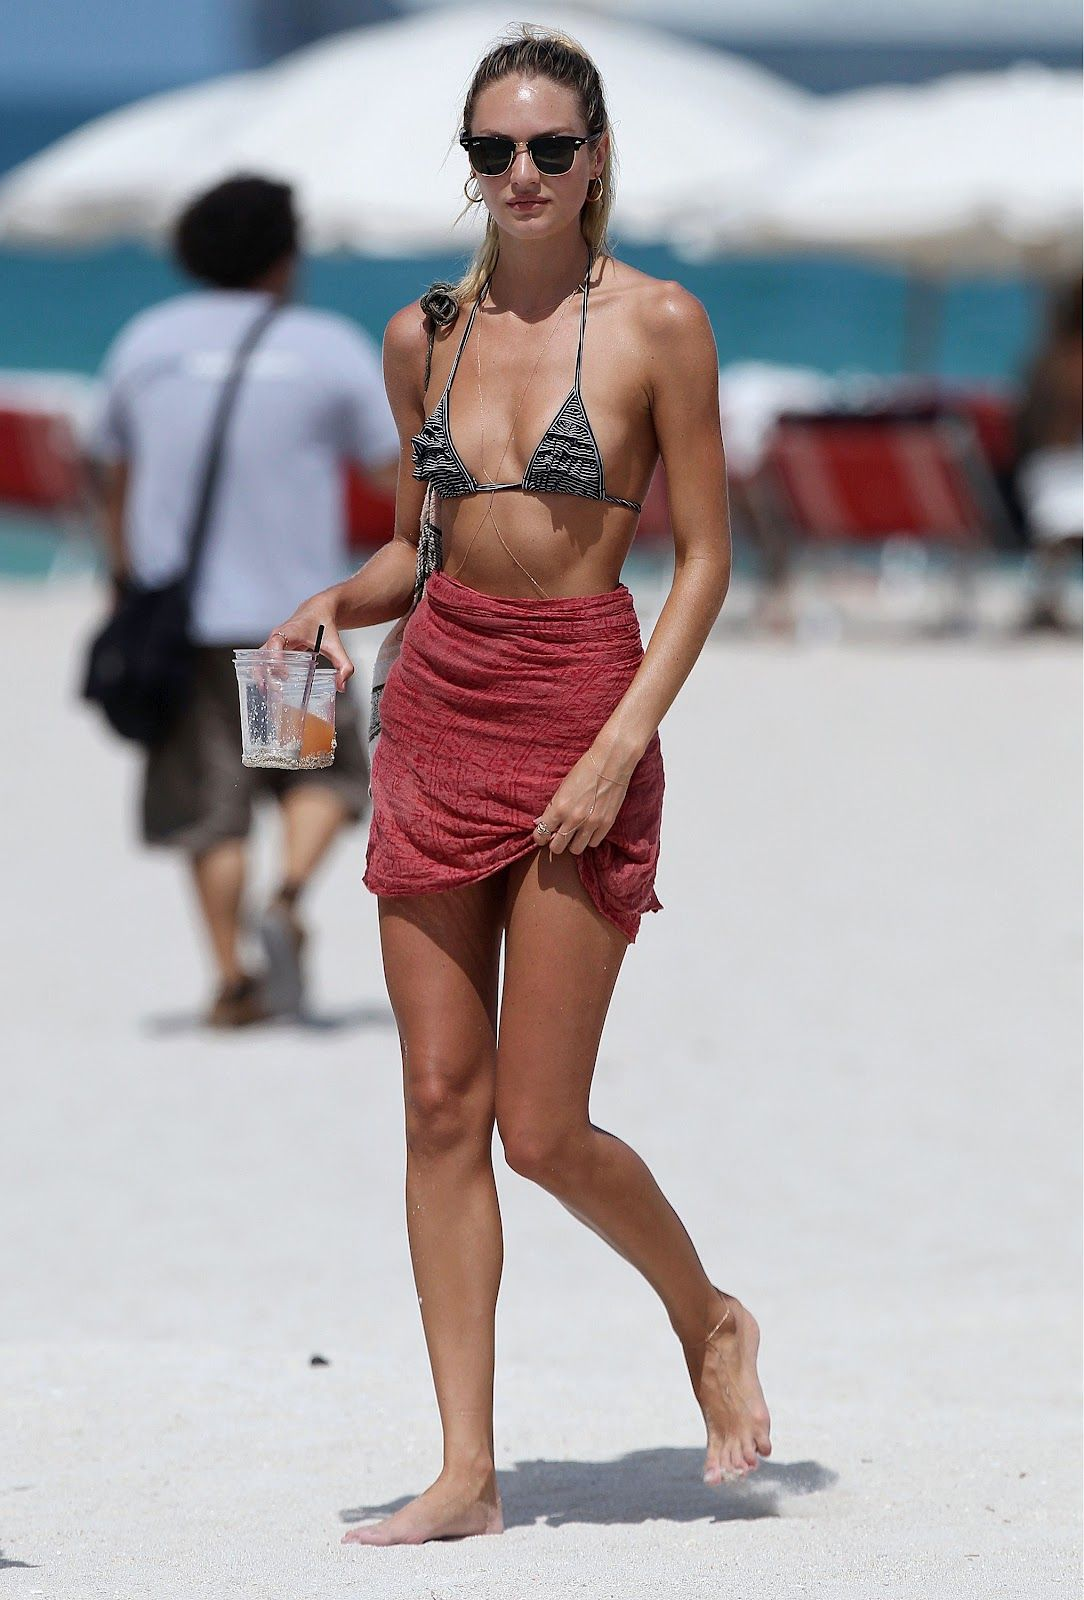 ae5712b04782 Candice Swanepoel beach style